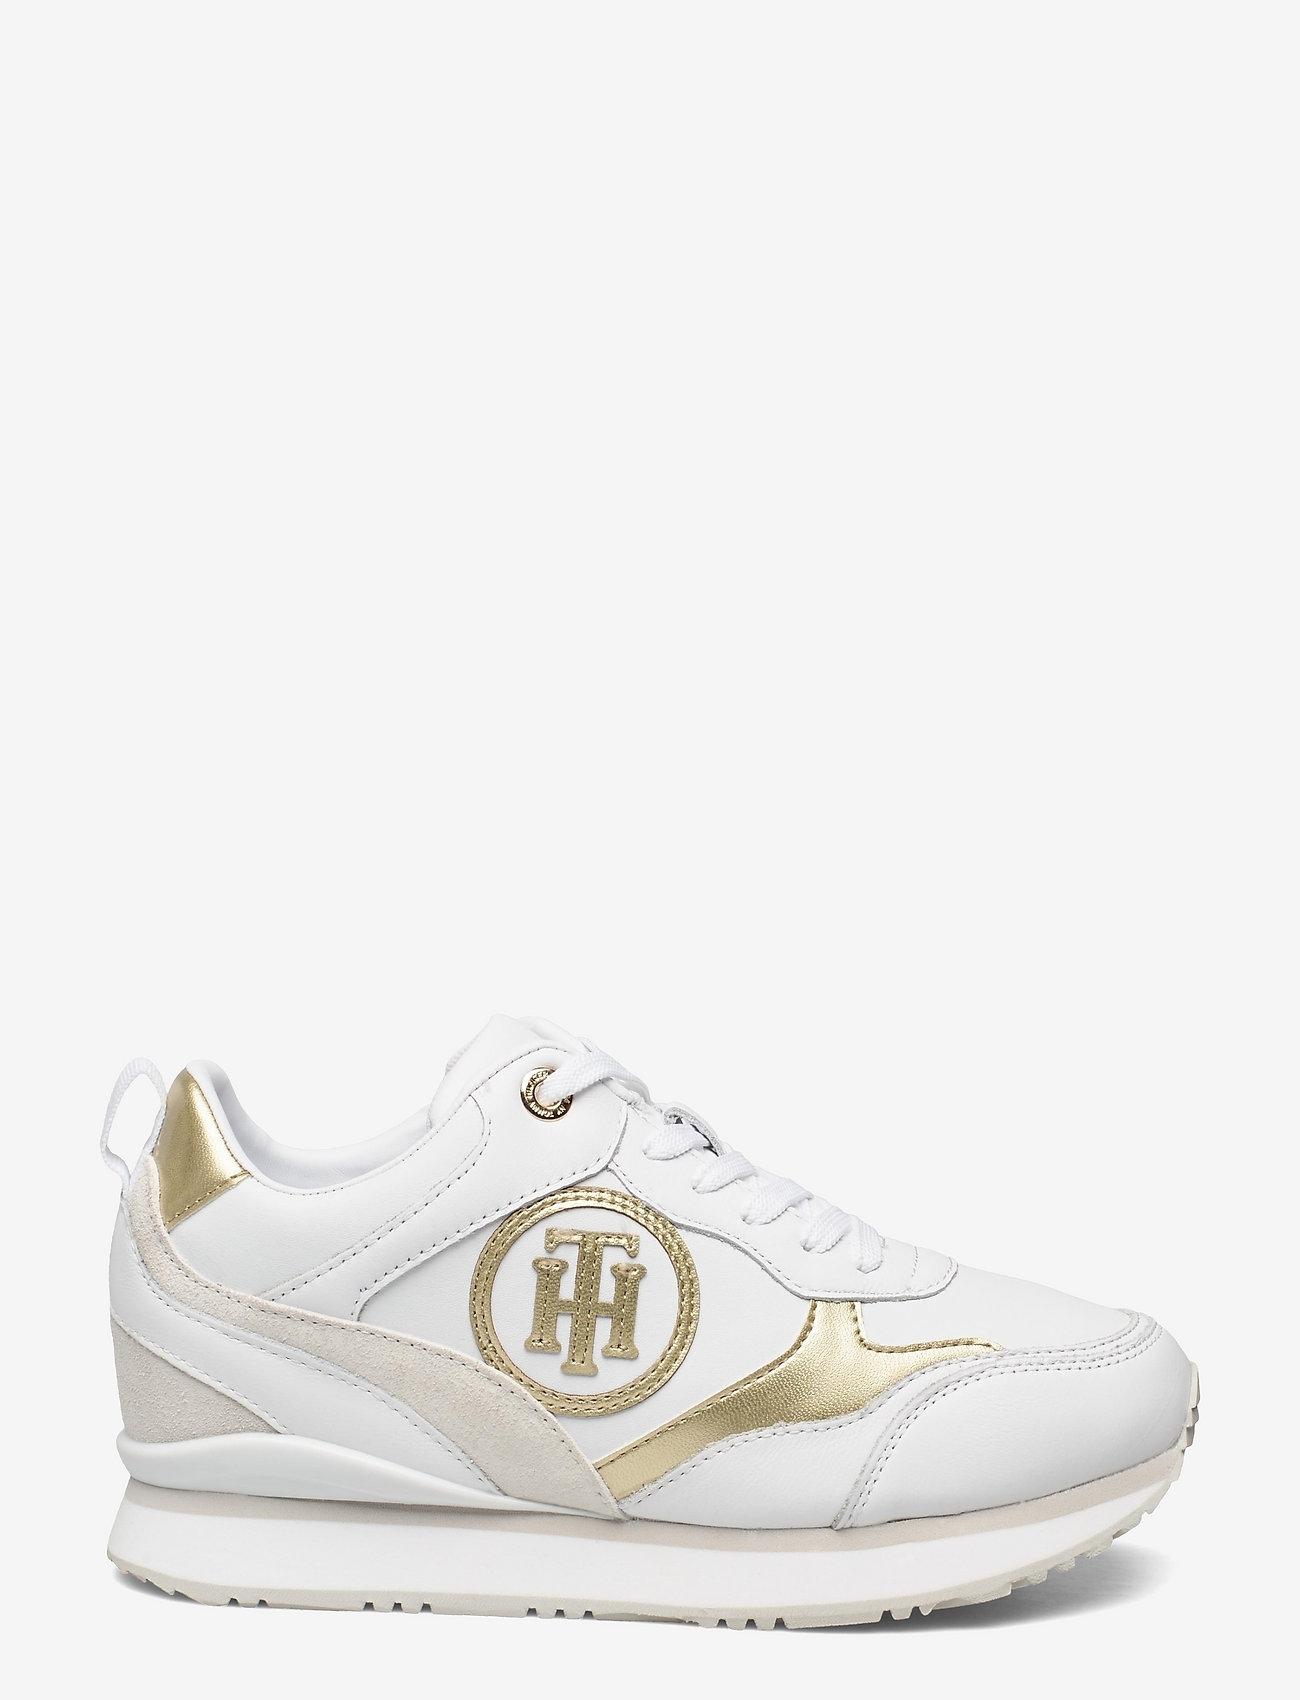 Tommy Hilfiger - METALLIC DRESSY WEDGE SNEAKER - low top sneakers - white - 1